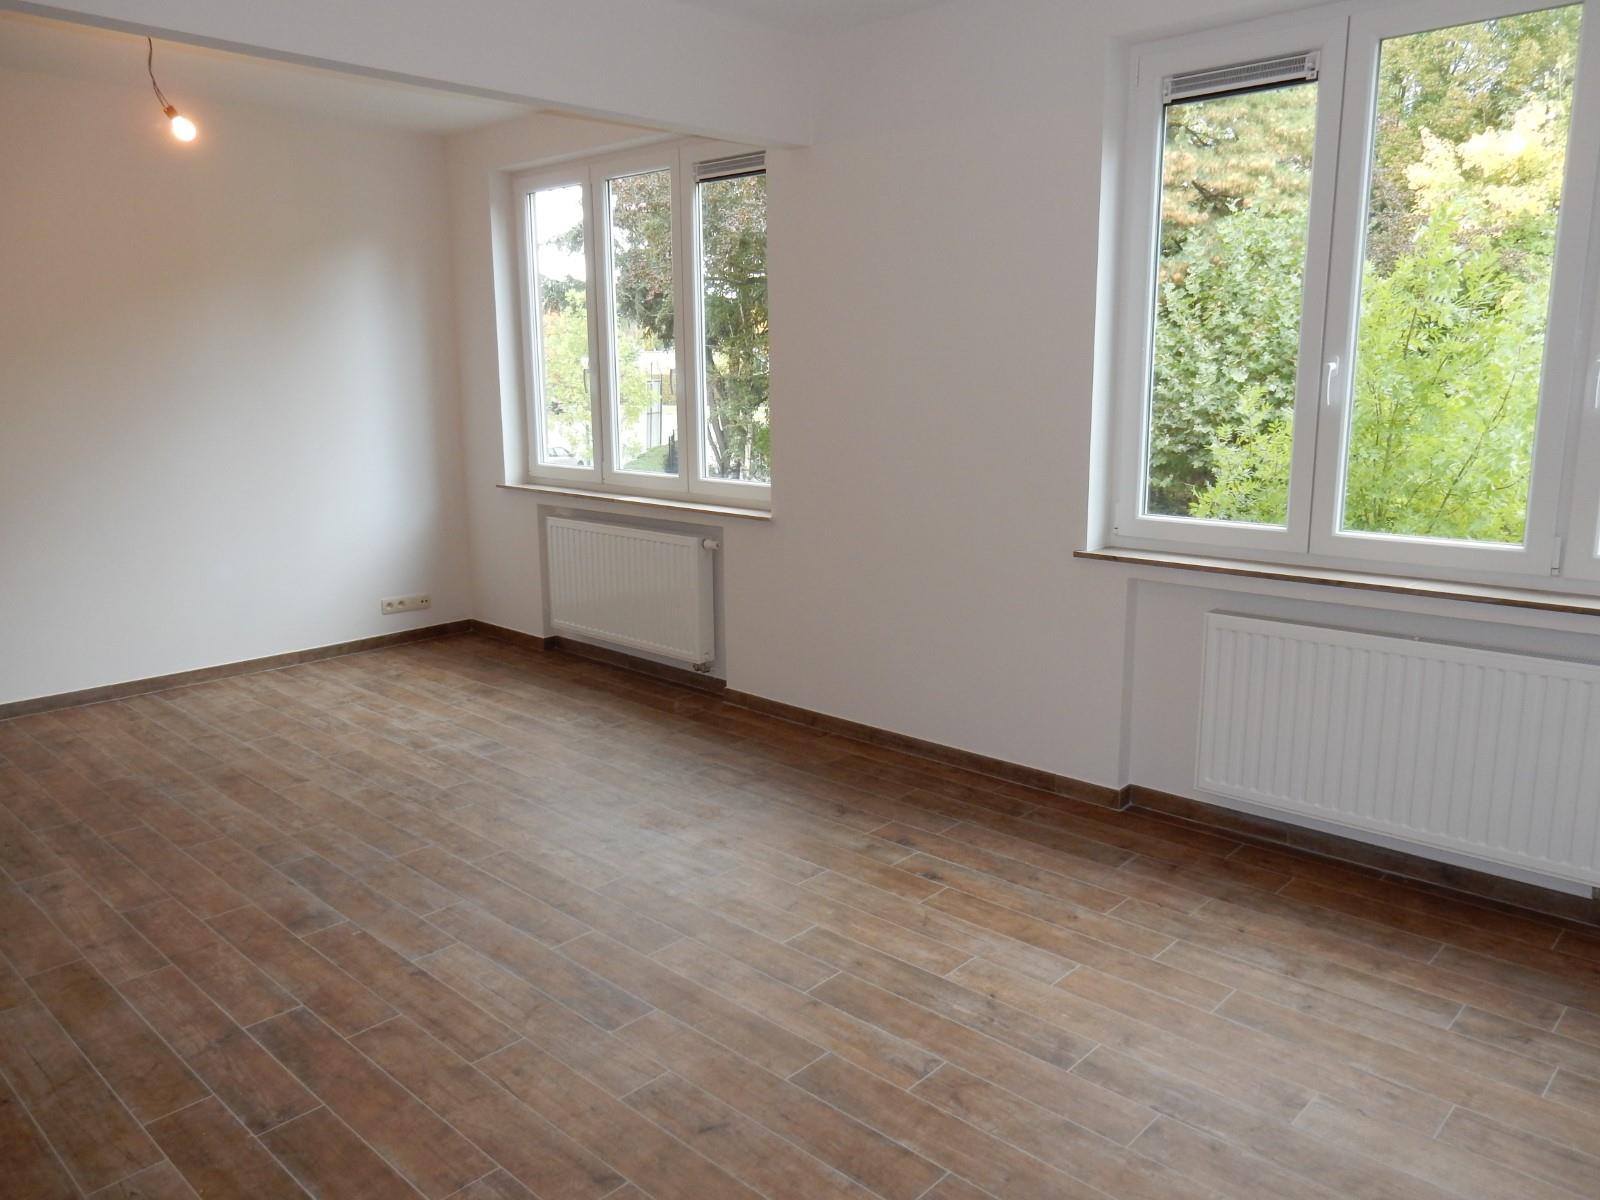 Appartement - Molenbeek-Saint-Jean - #3532282-0